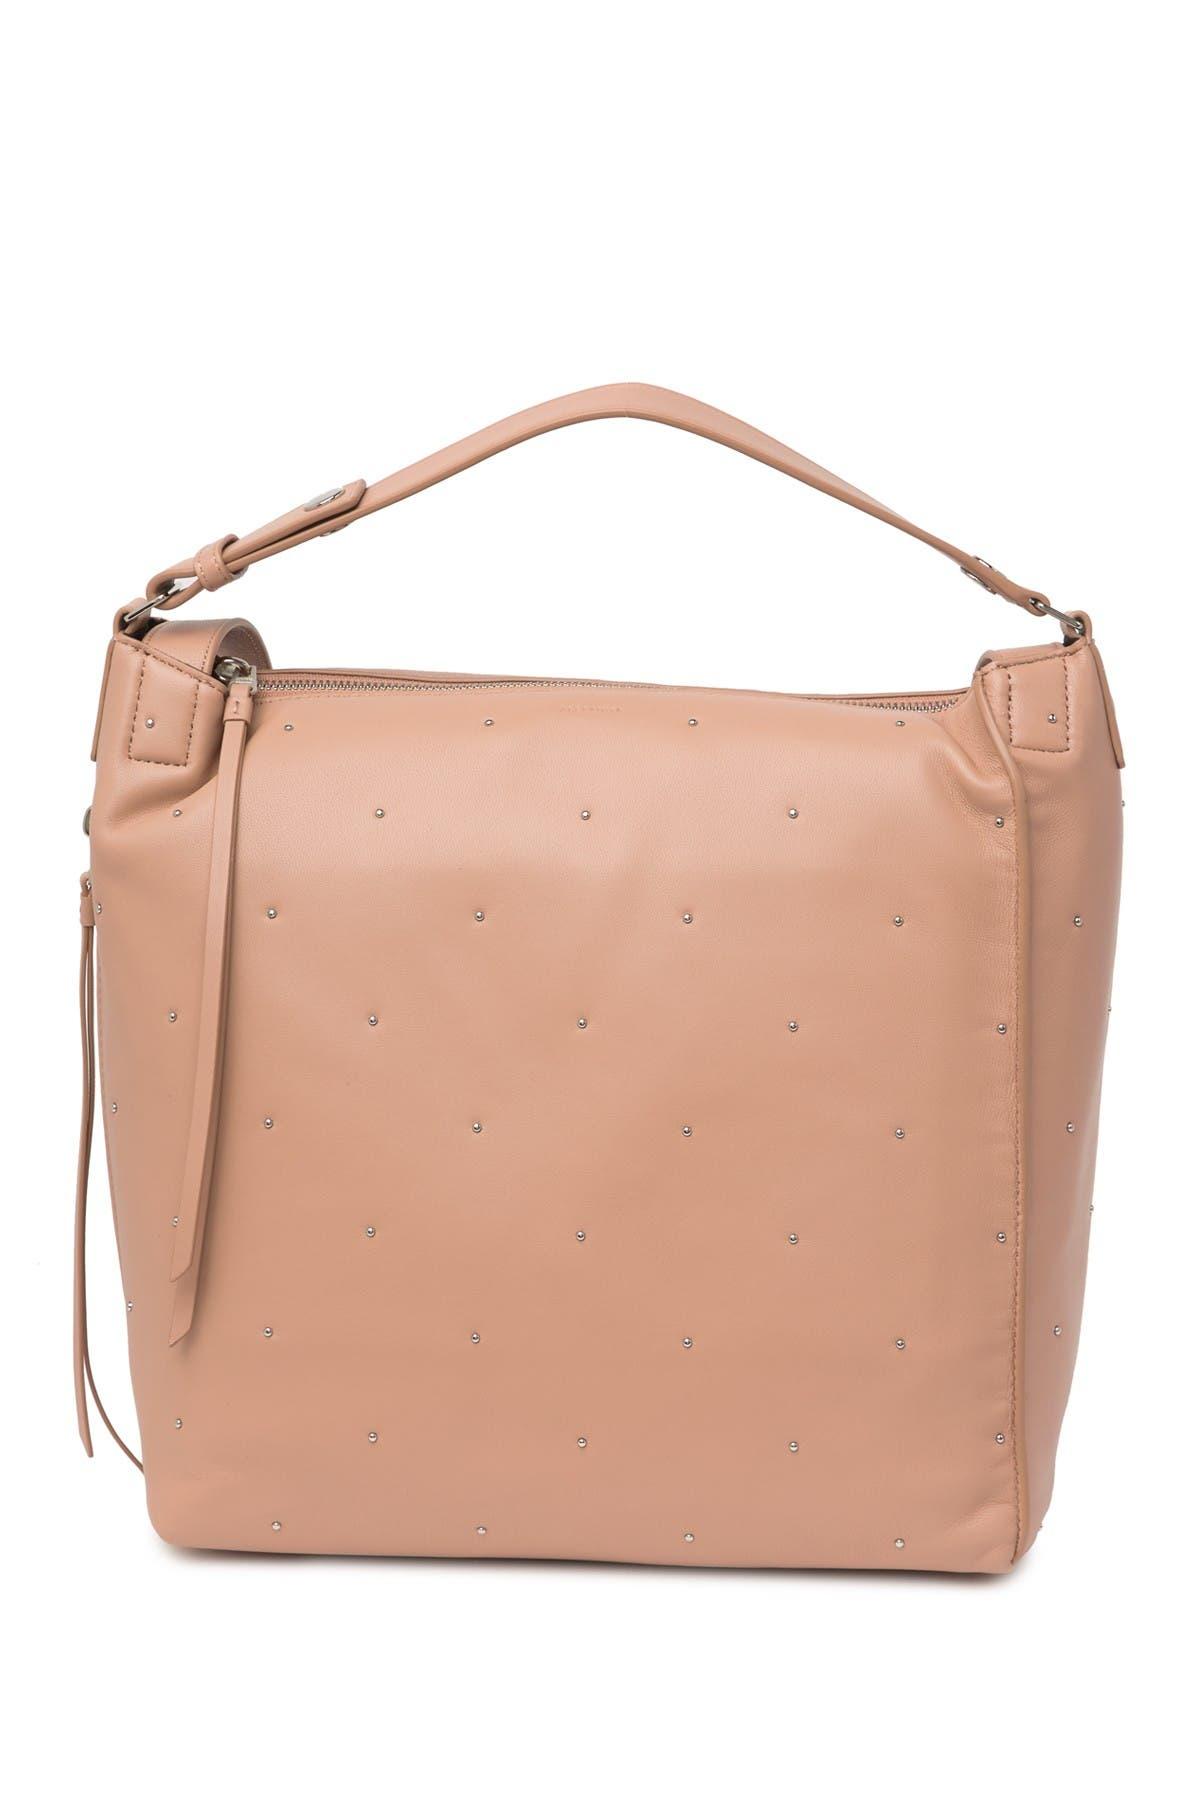 Image of ALLSAINTS Kathi Studded Leather Backpack